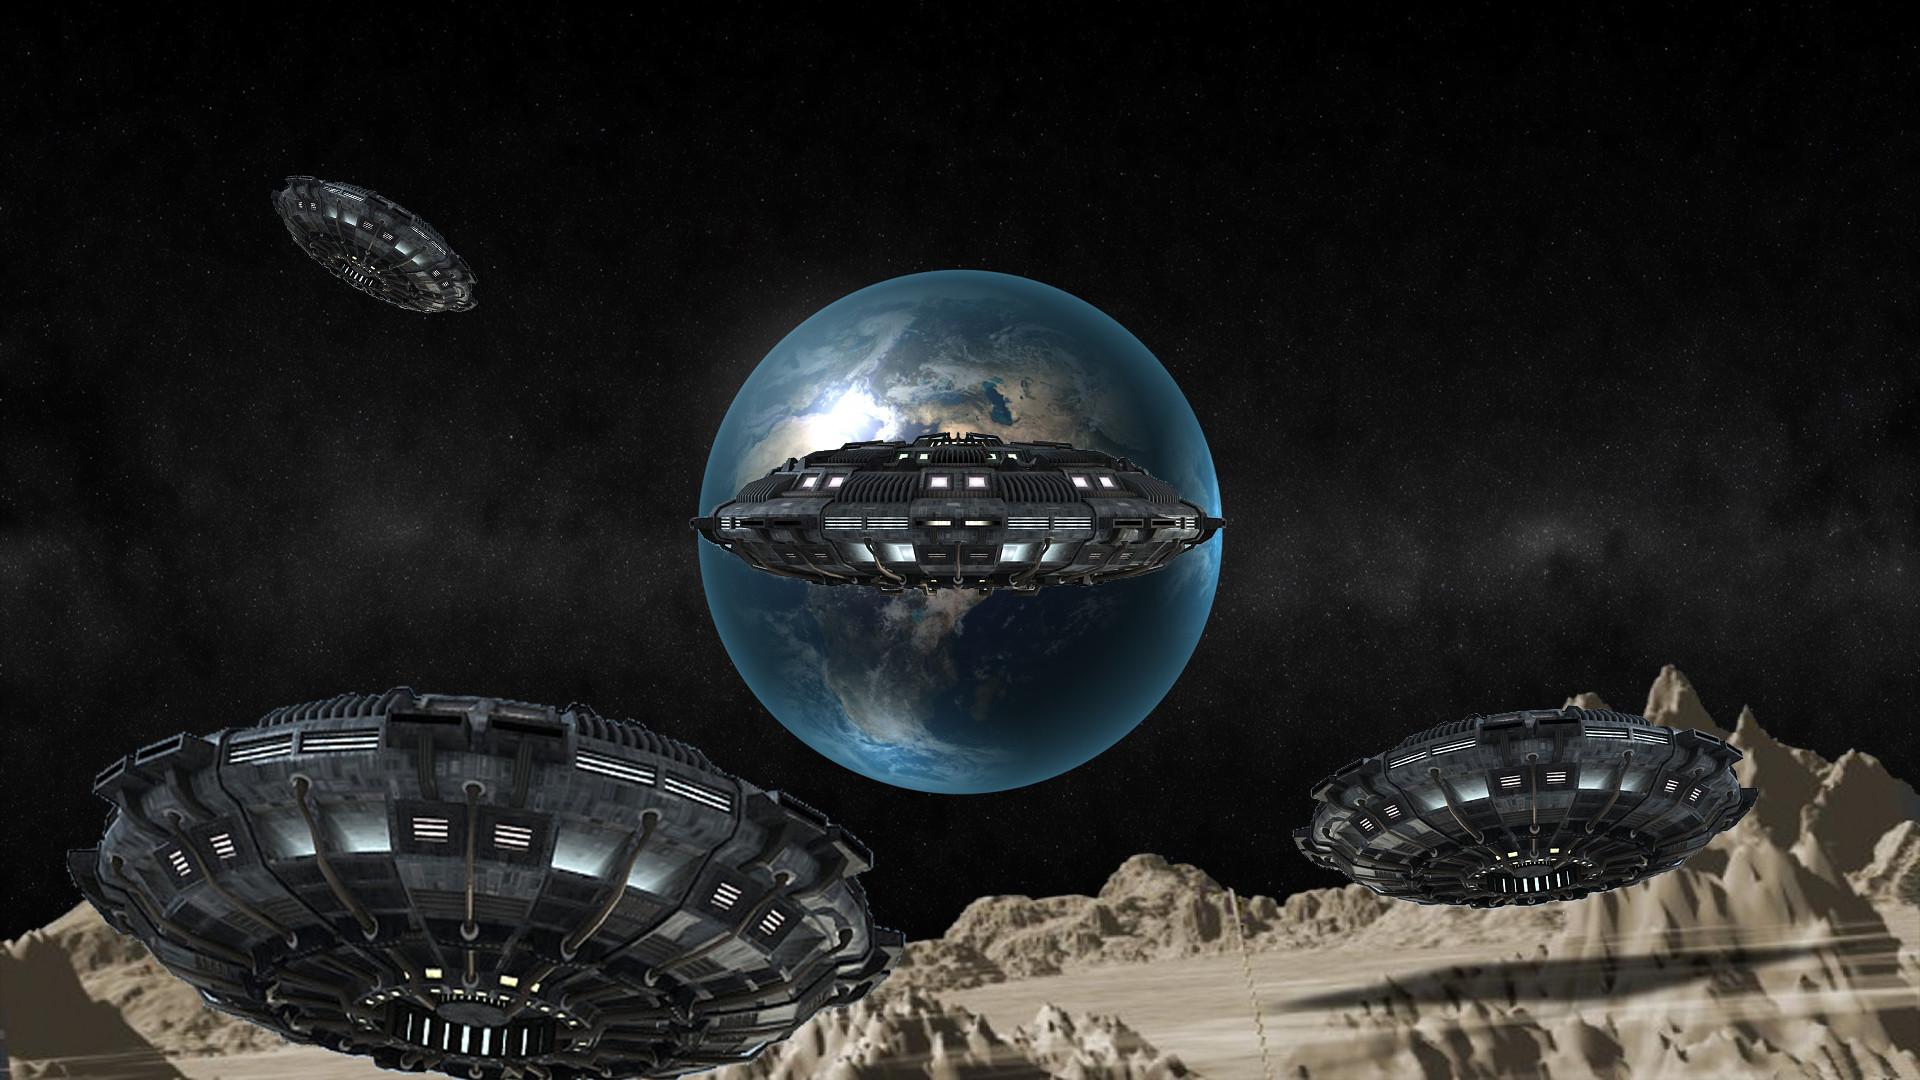 HD UFO Wallpaper / Space-earth-nasa-hd-wallpapers .